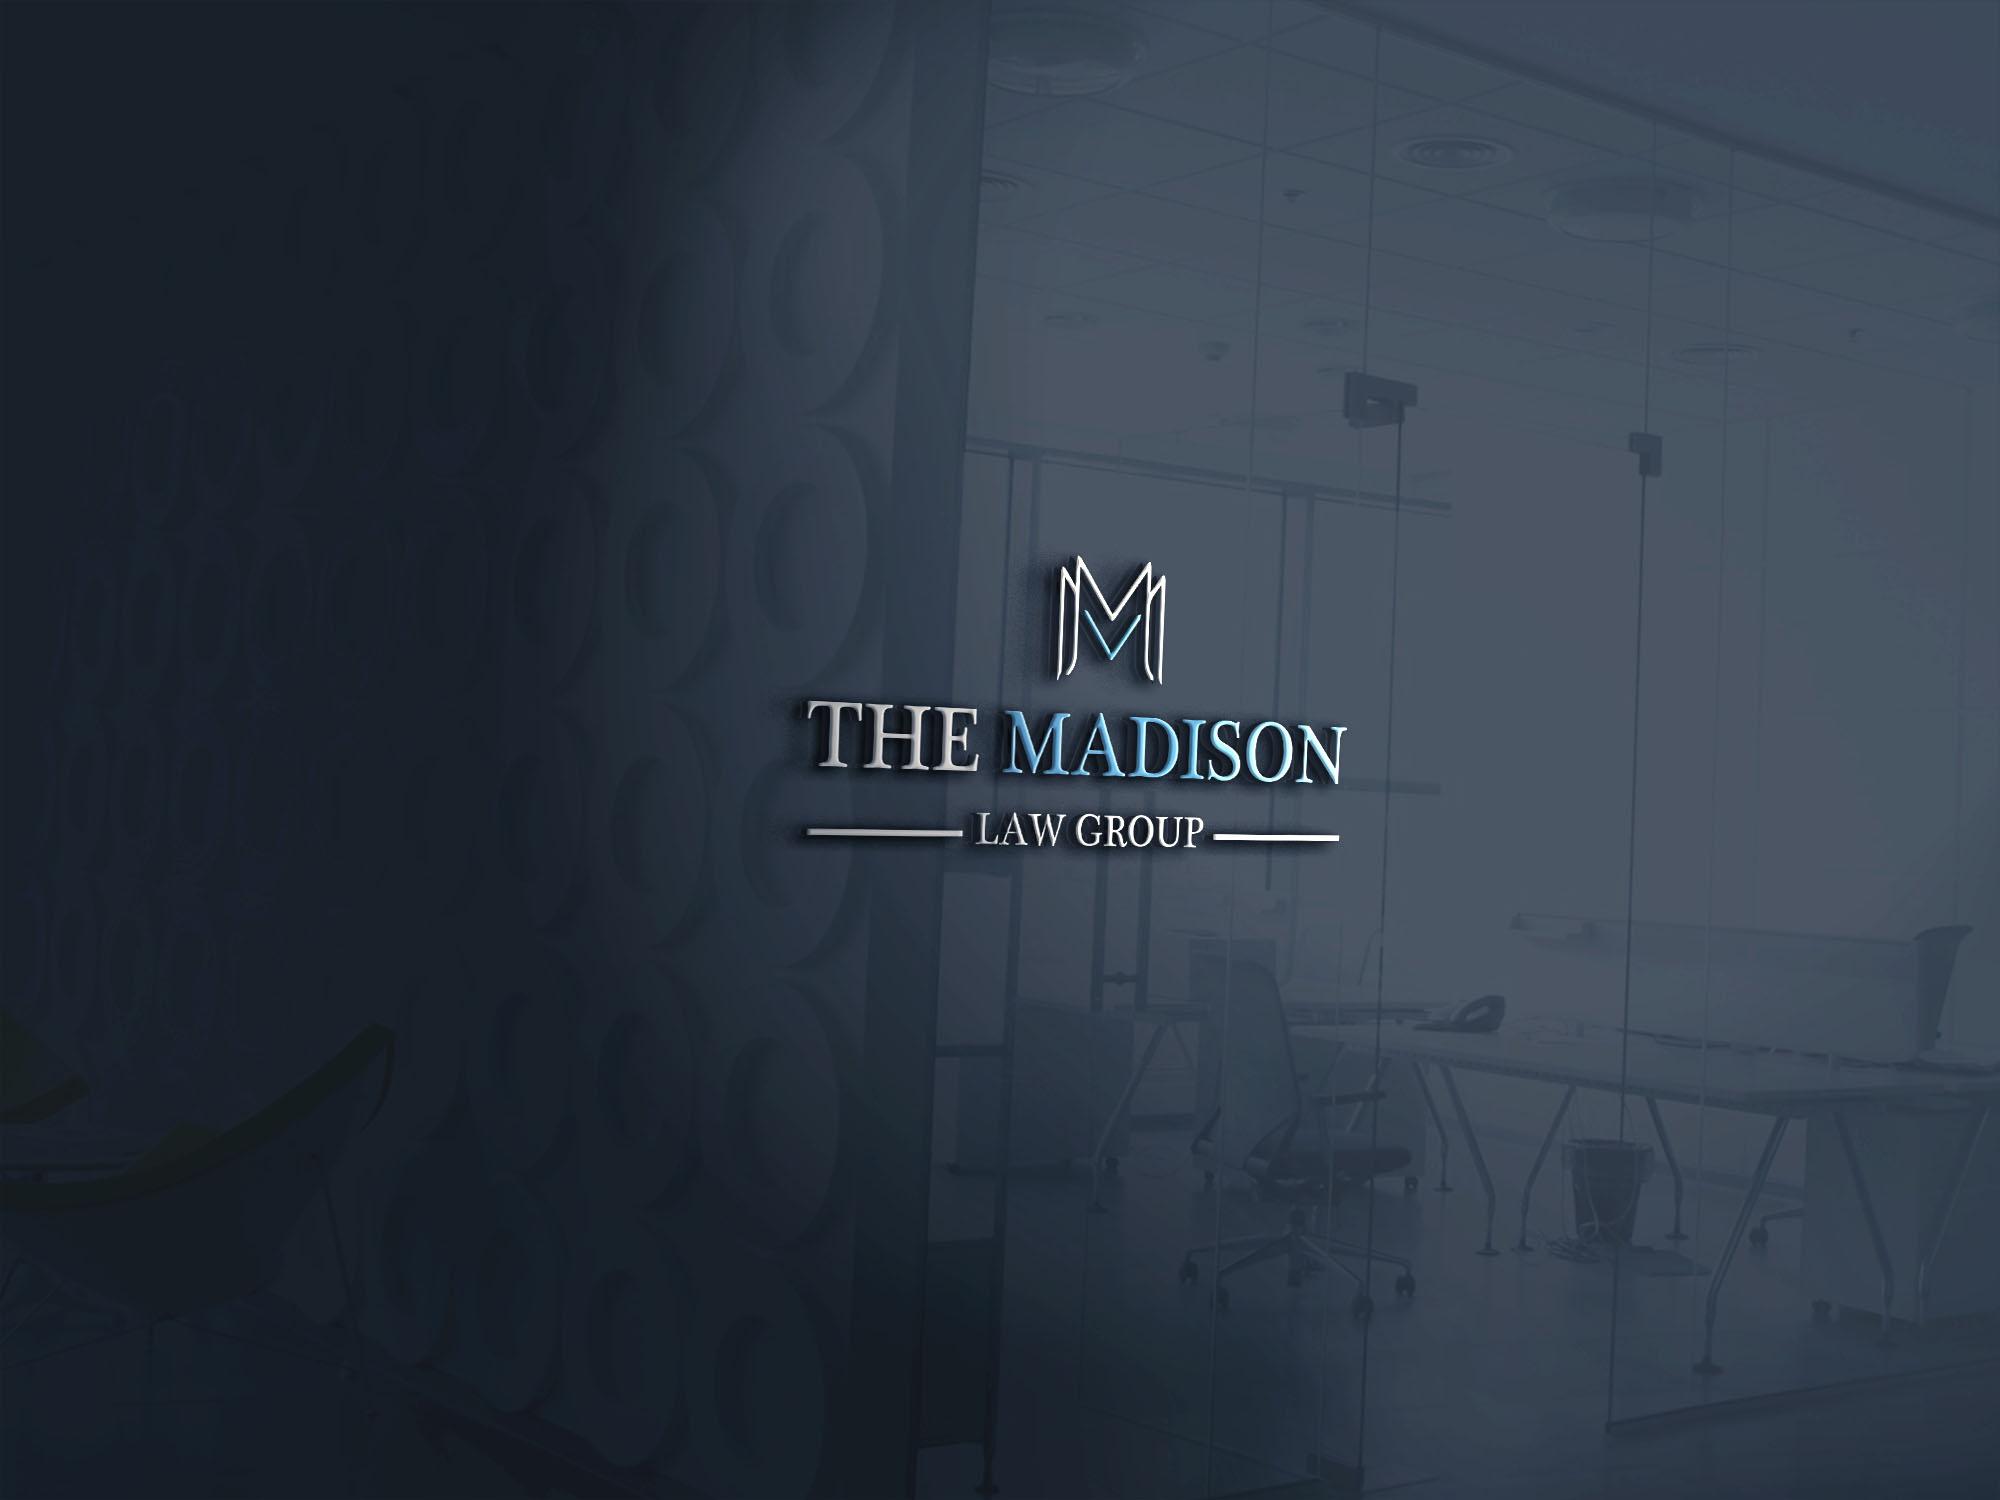 I will do minimalist modern and unique business logo design